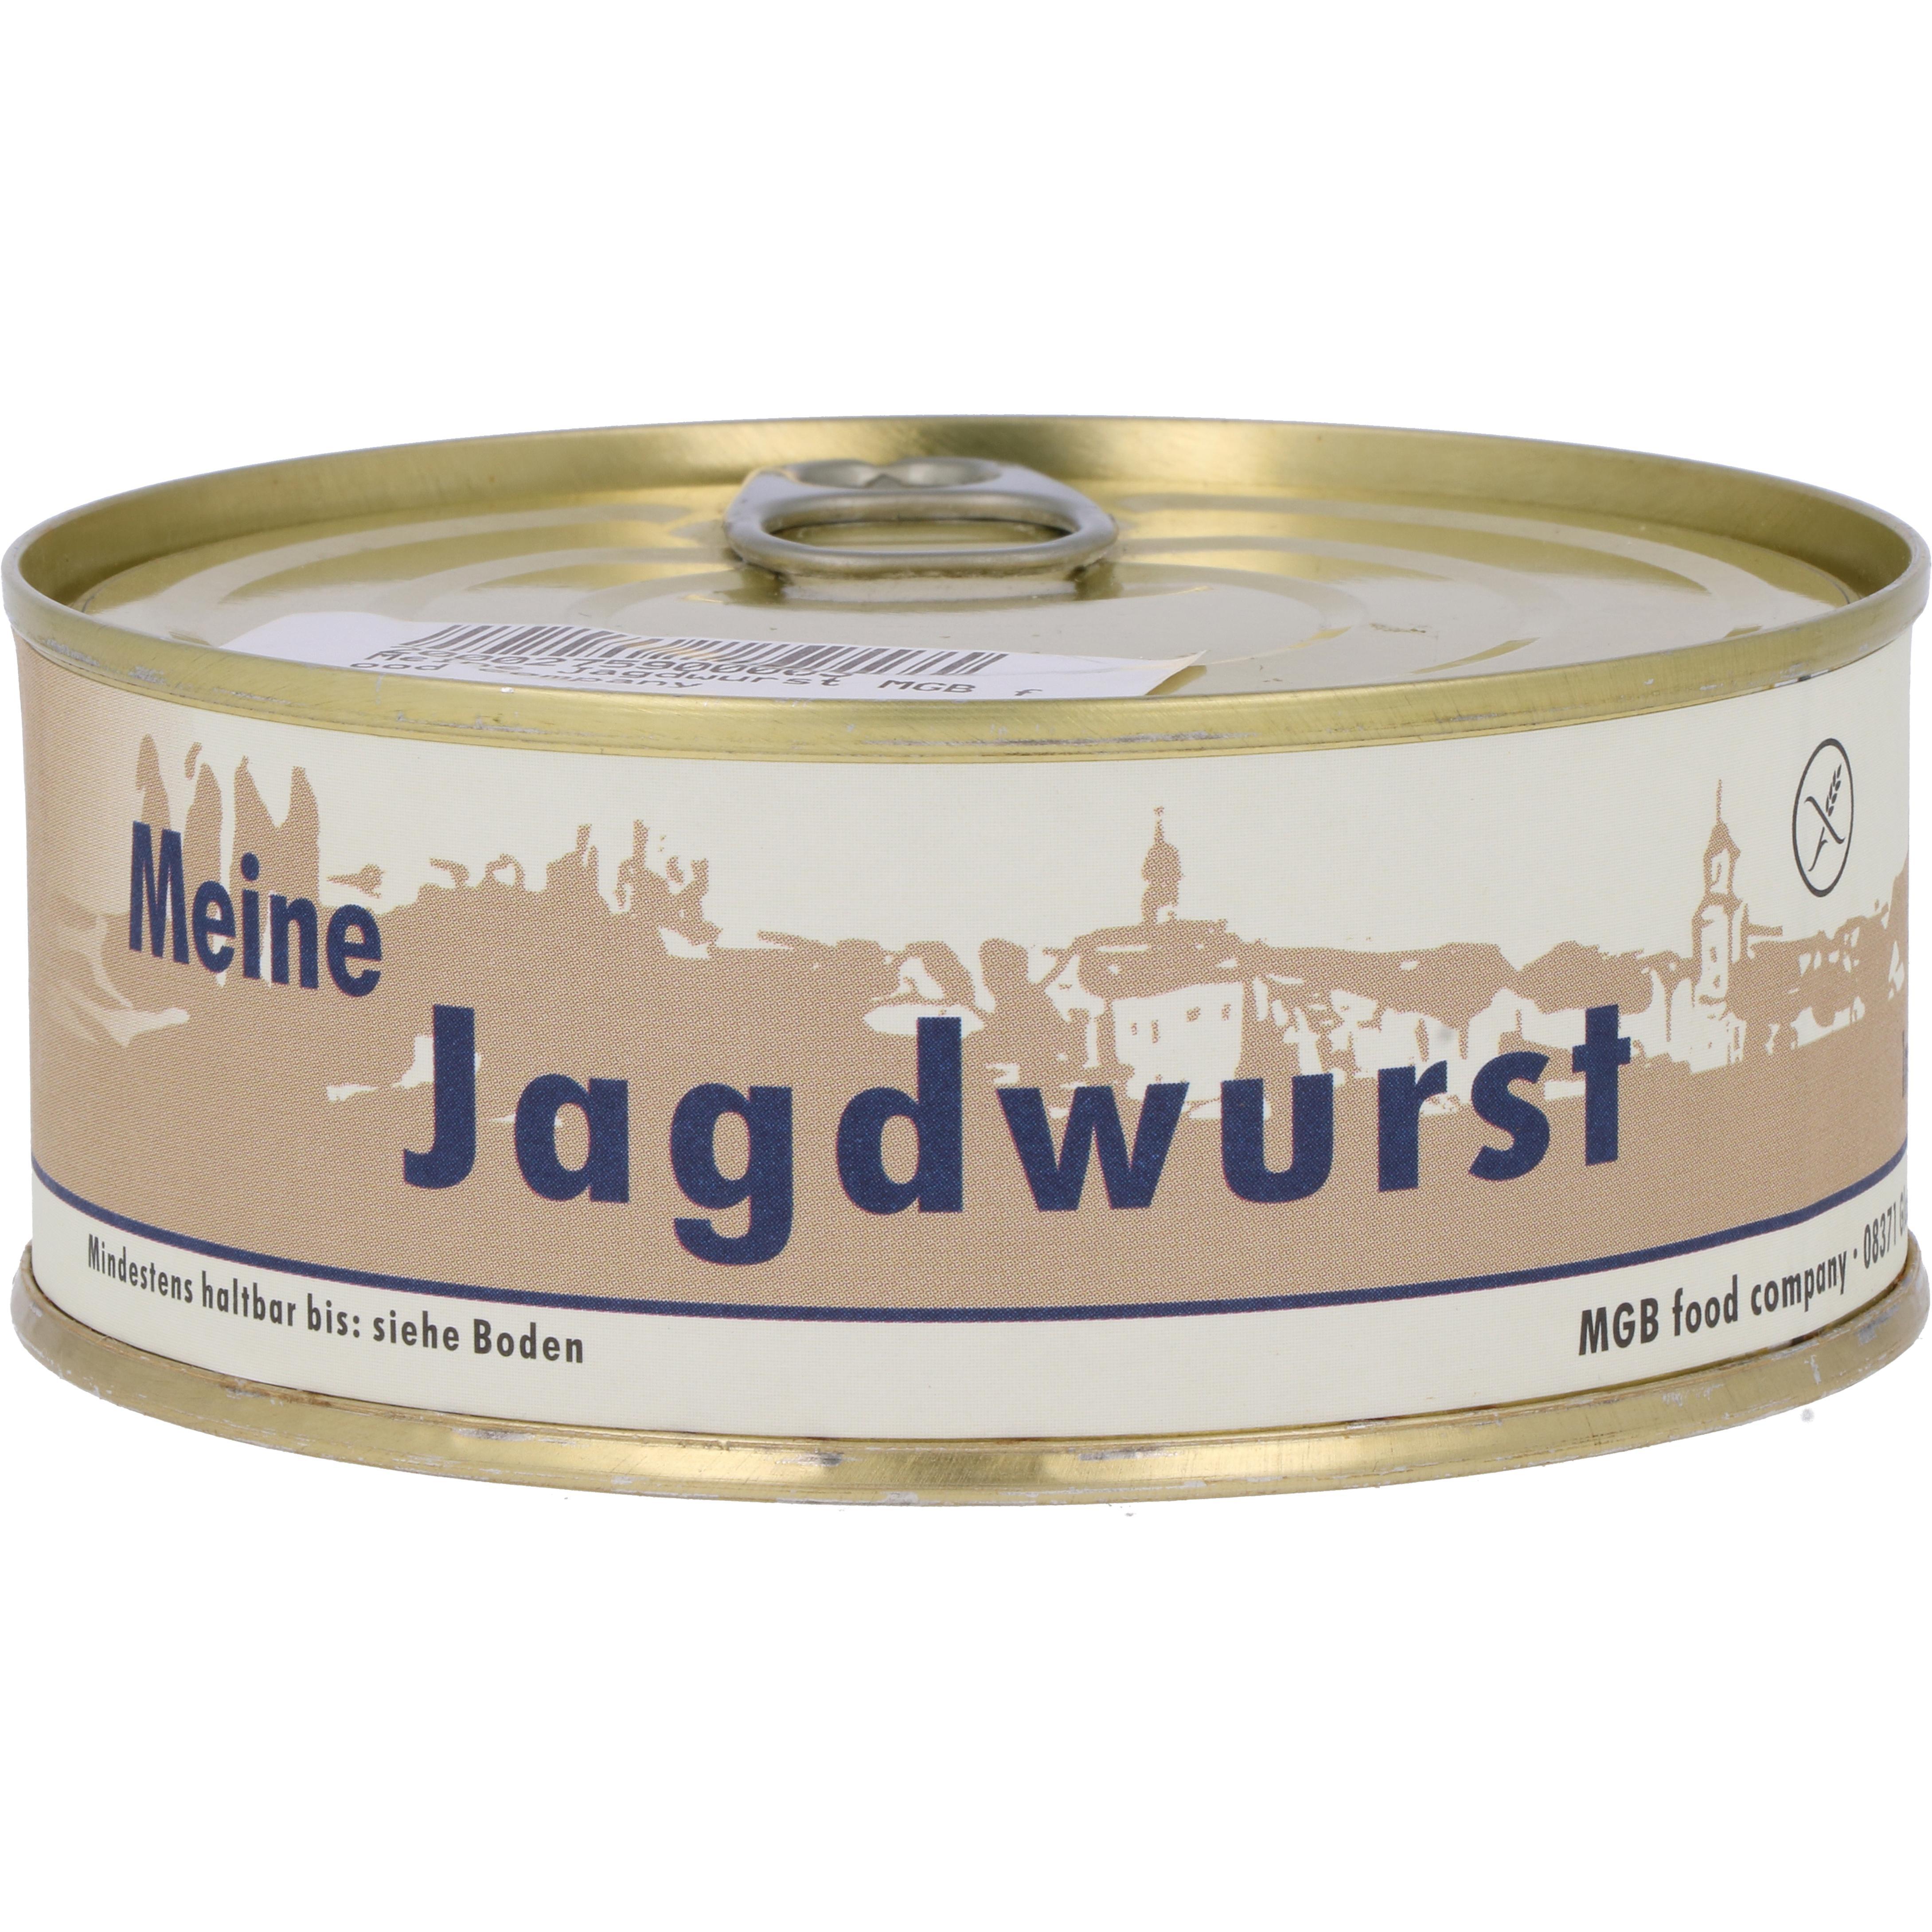 MGB food company Meine Jagdwurst 220g